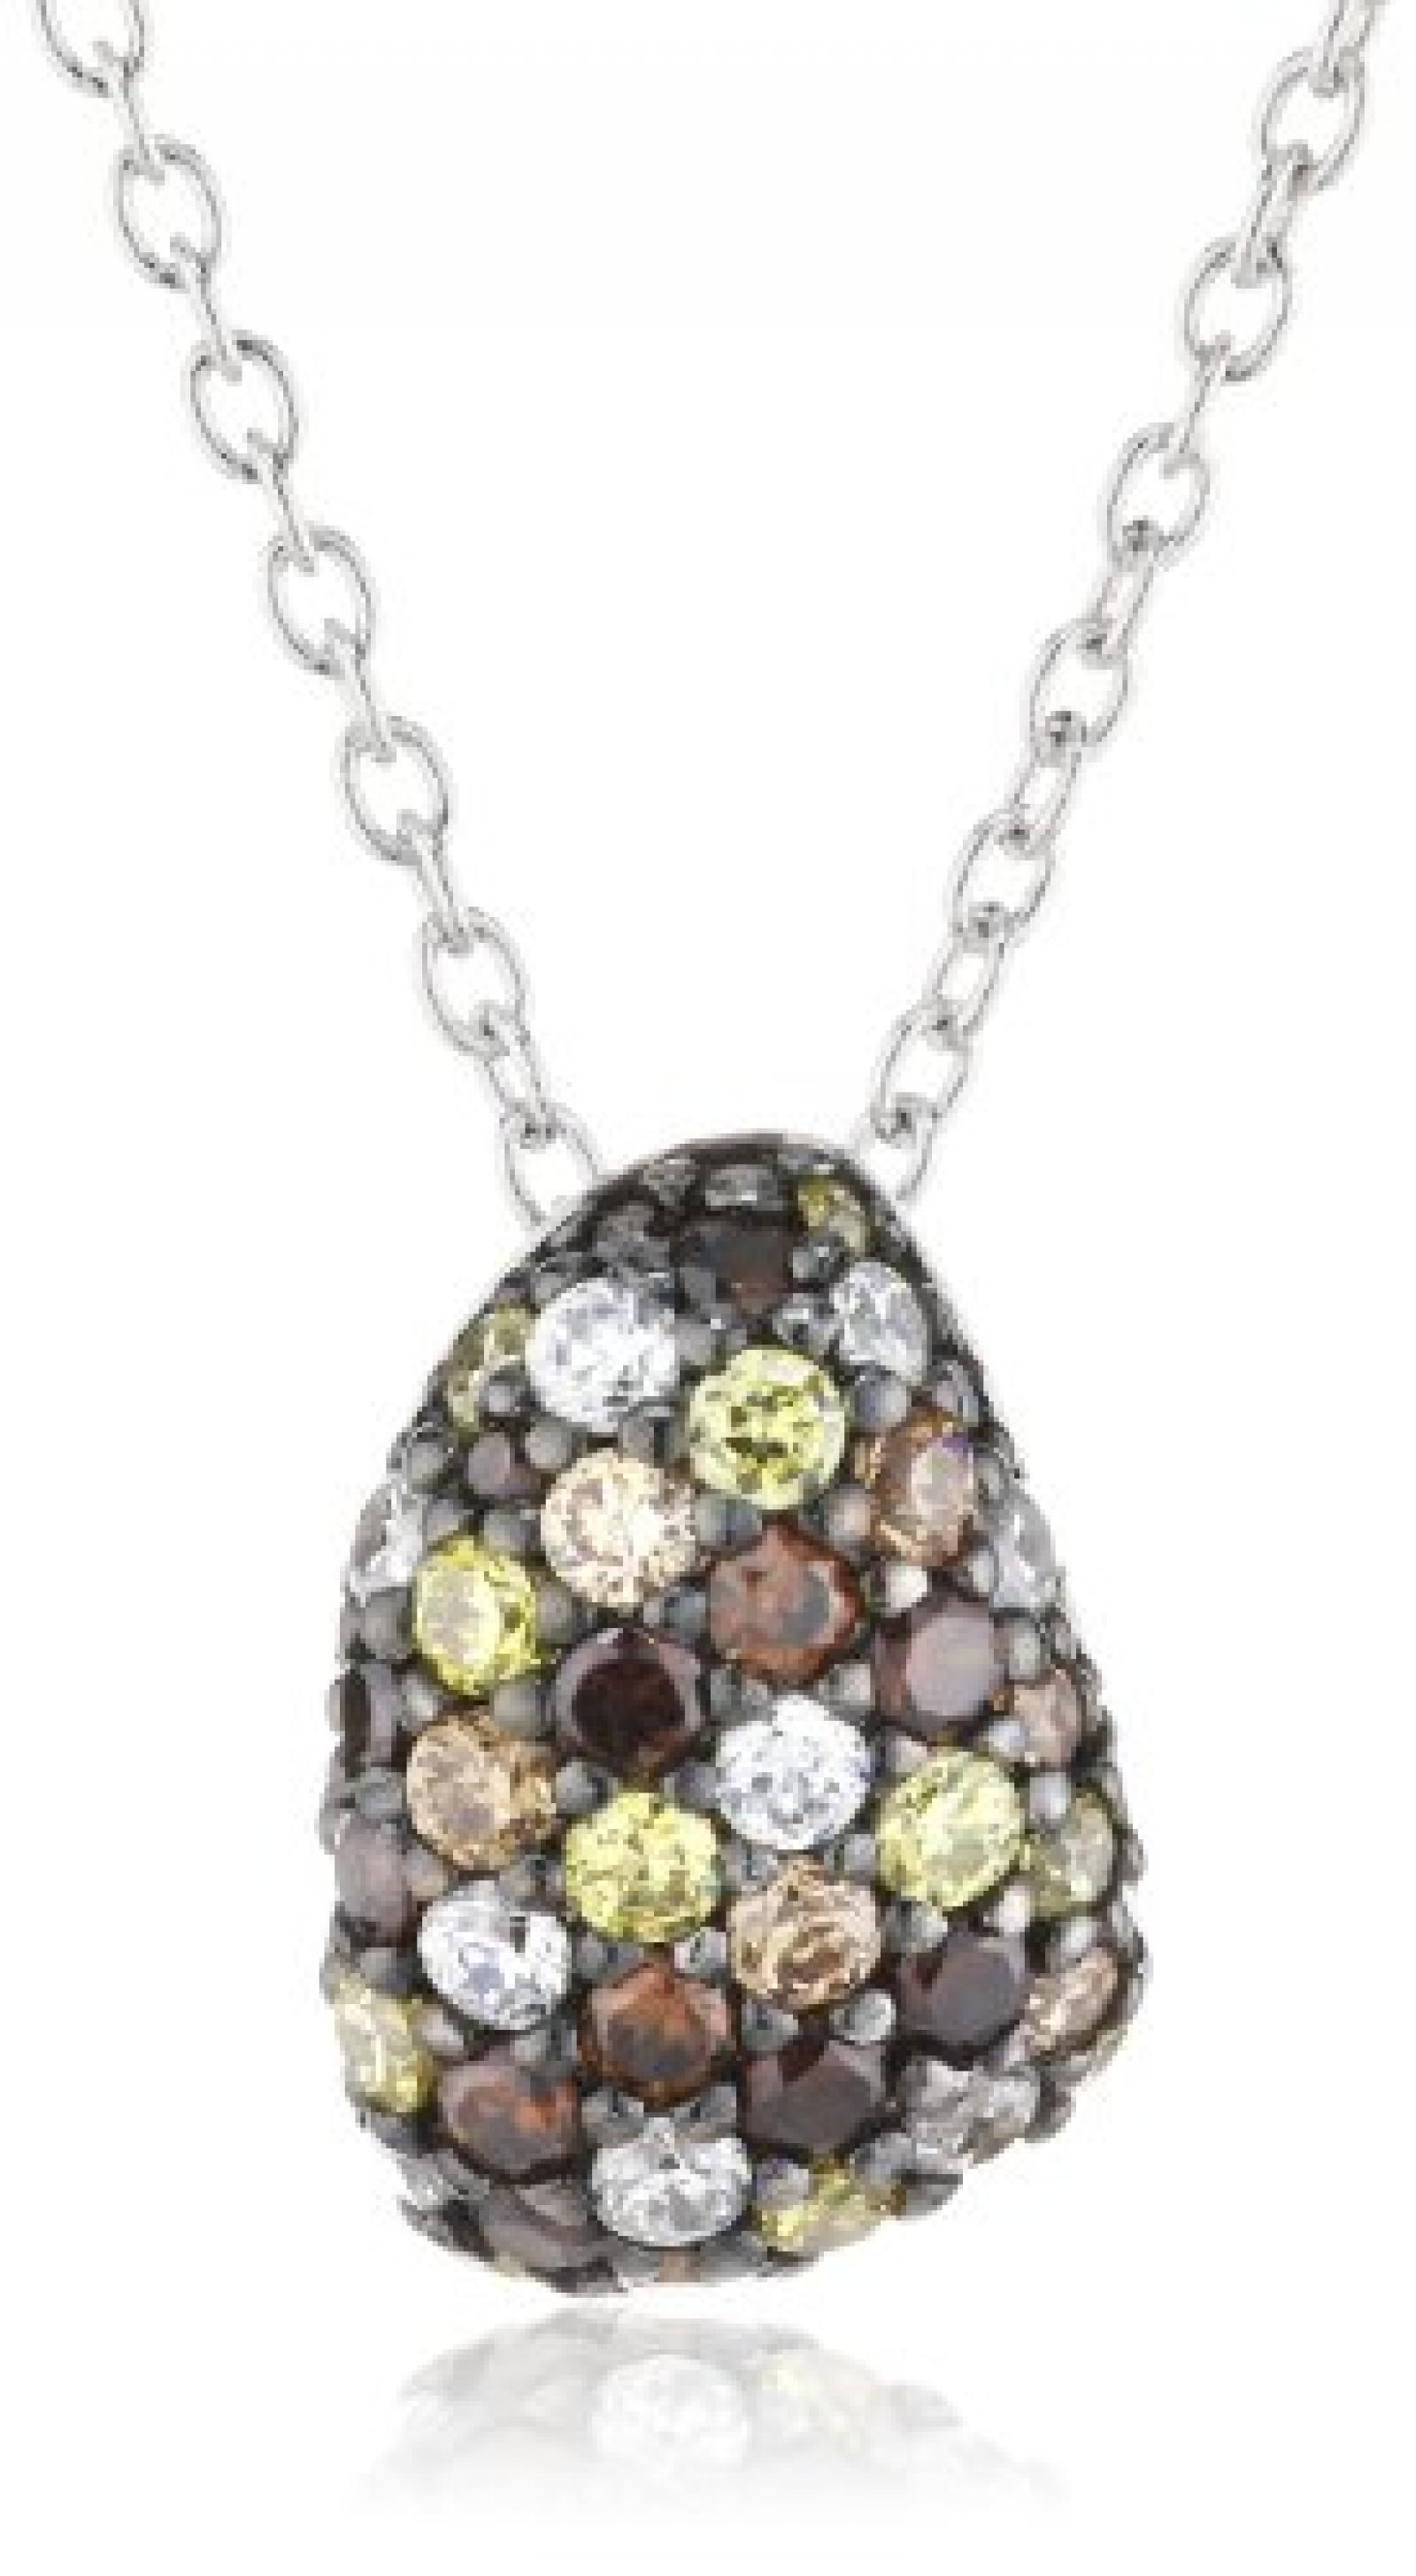 Damen Halskette Extreme Pavée Glas Zirkonia 925 Sterling Silber rhodiniert 42 cm JPNL90499E420